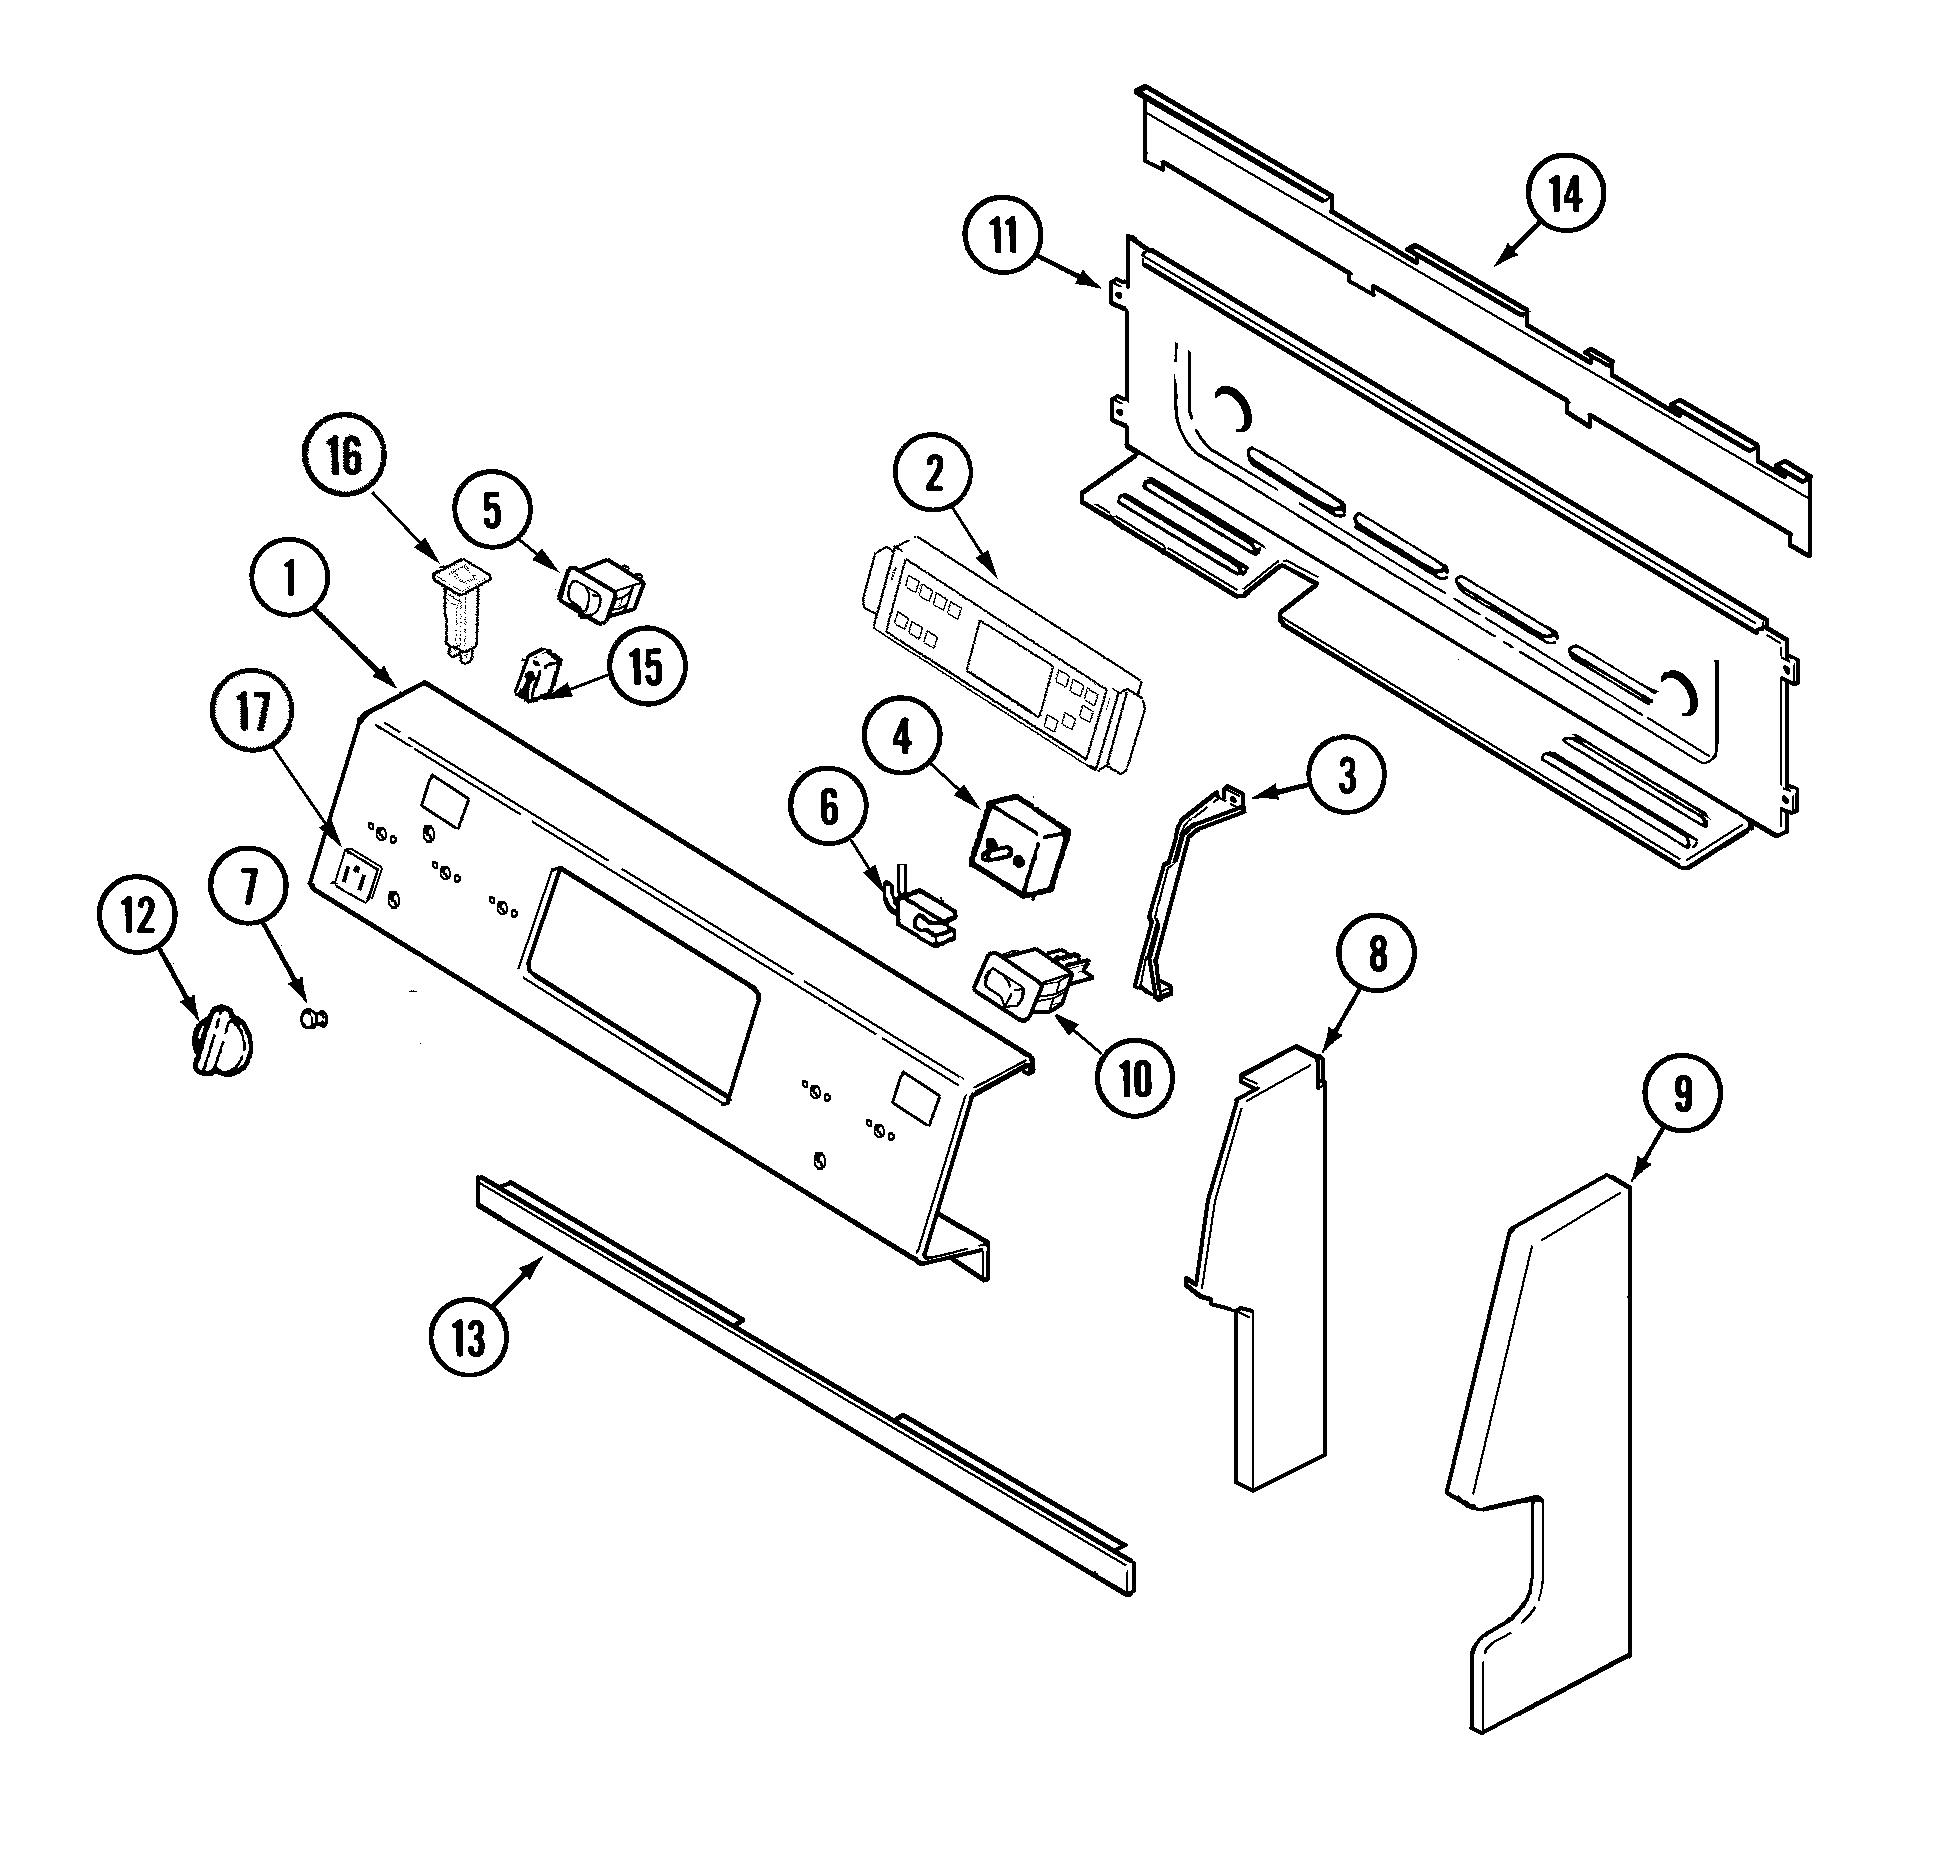 hight resolution of mer6772bcb range control panel parts diagram